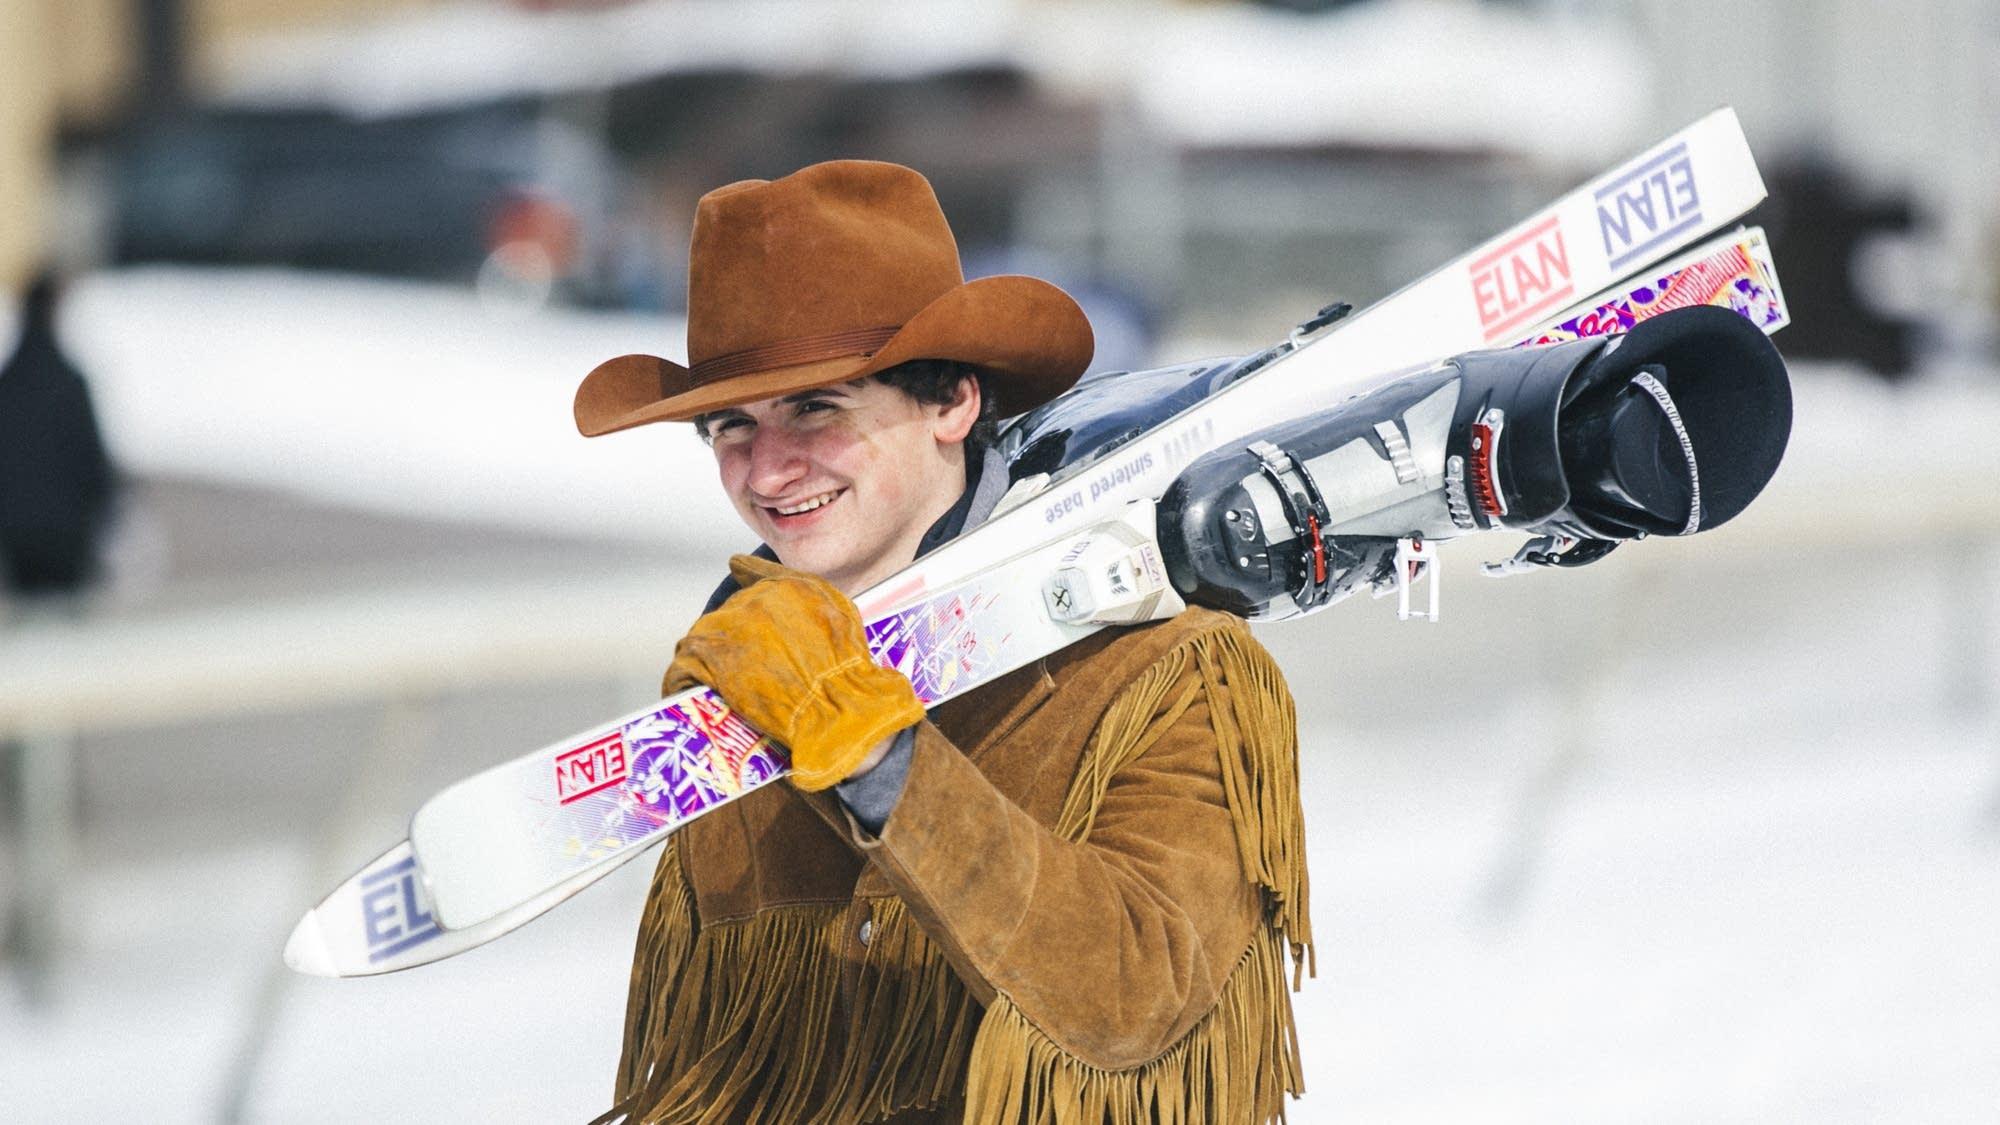 Dakota Morris carries his skis toward the starting line.